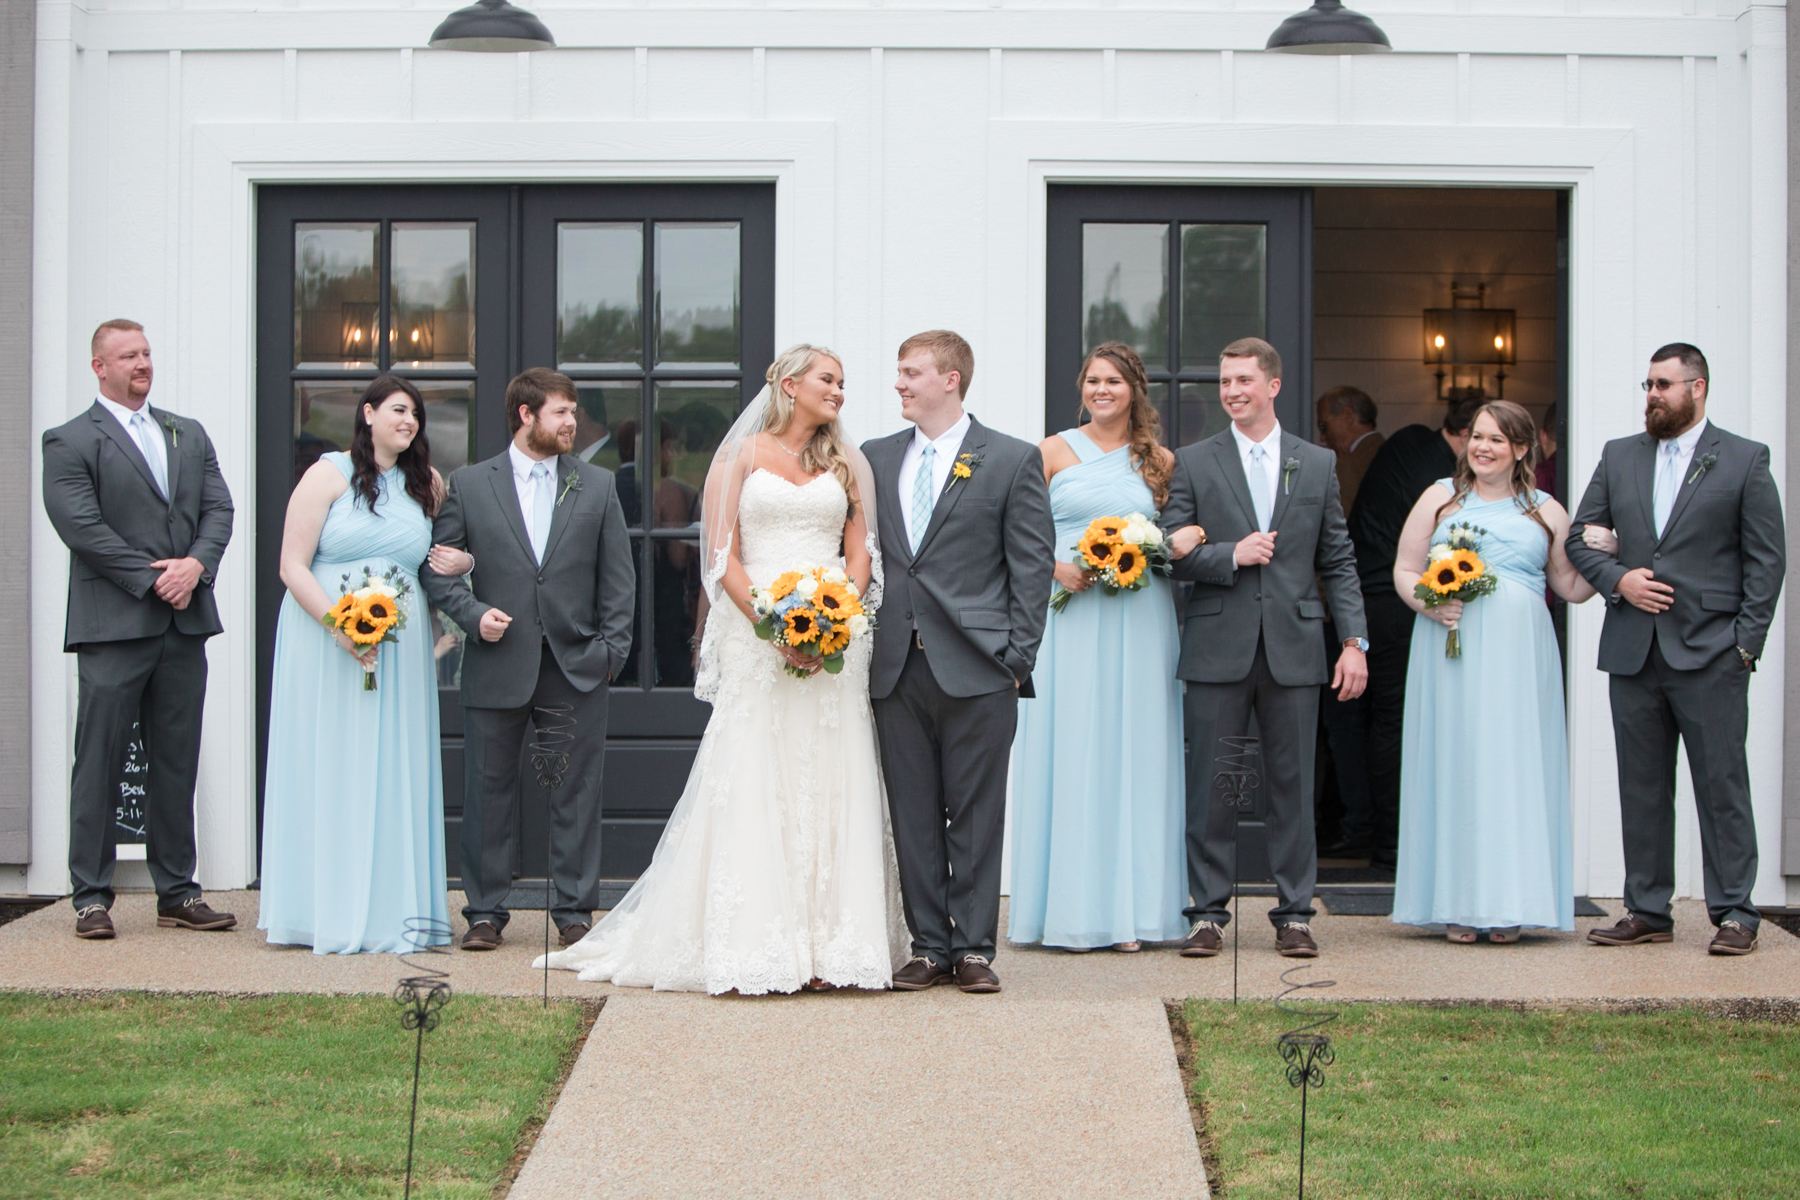 The-venue-at-white-oak-farms-wedding-nashville-wedding-photographers-0171.jpg